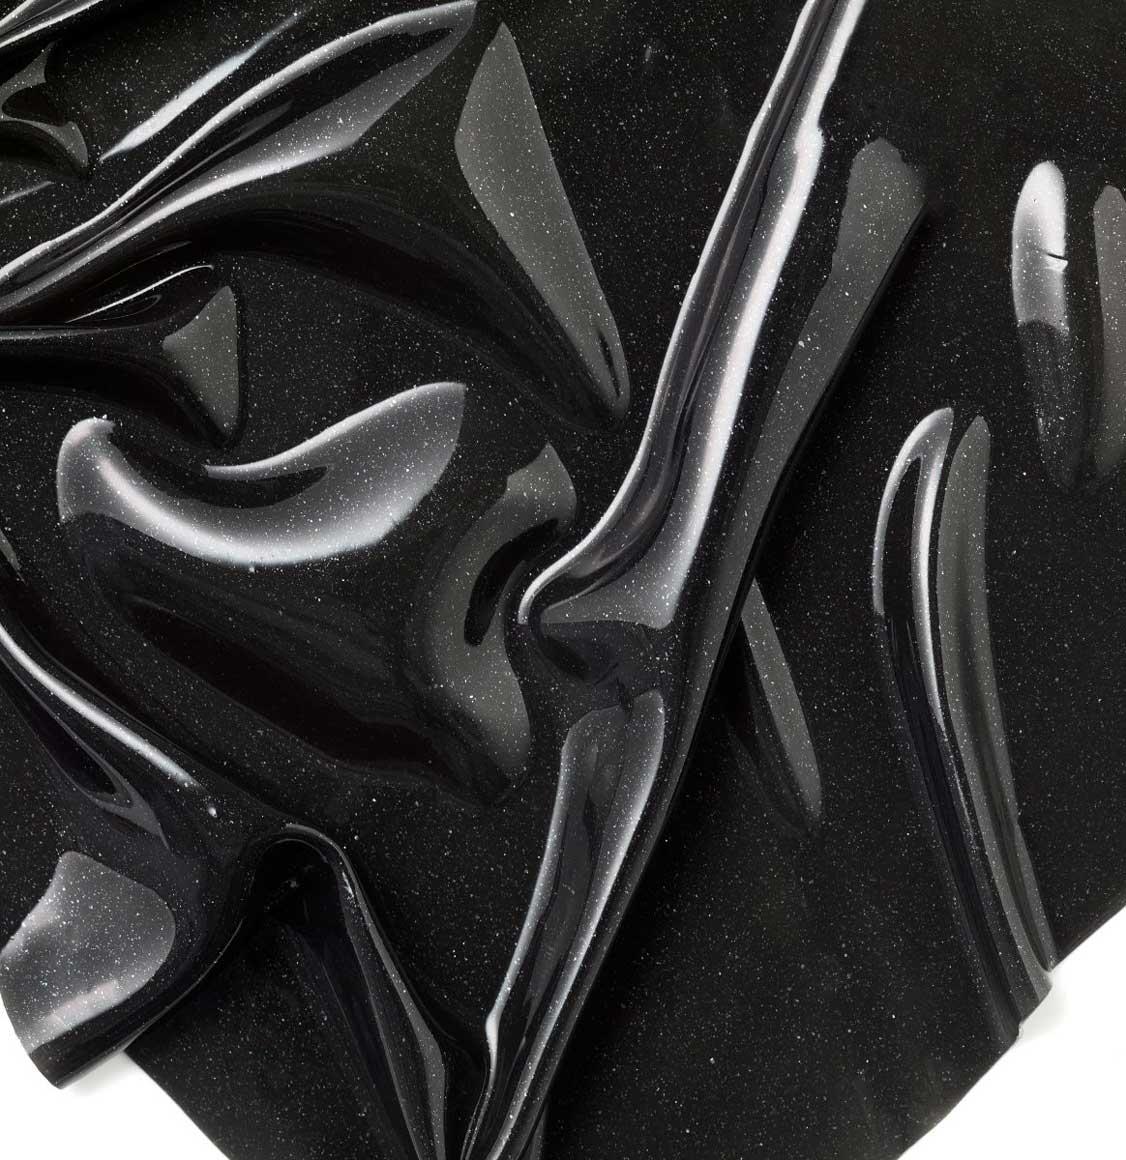 111Skin Celestial Black Diamond Lifting And Firming Neck 43ml